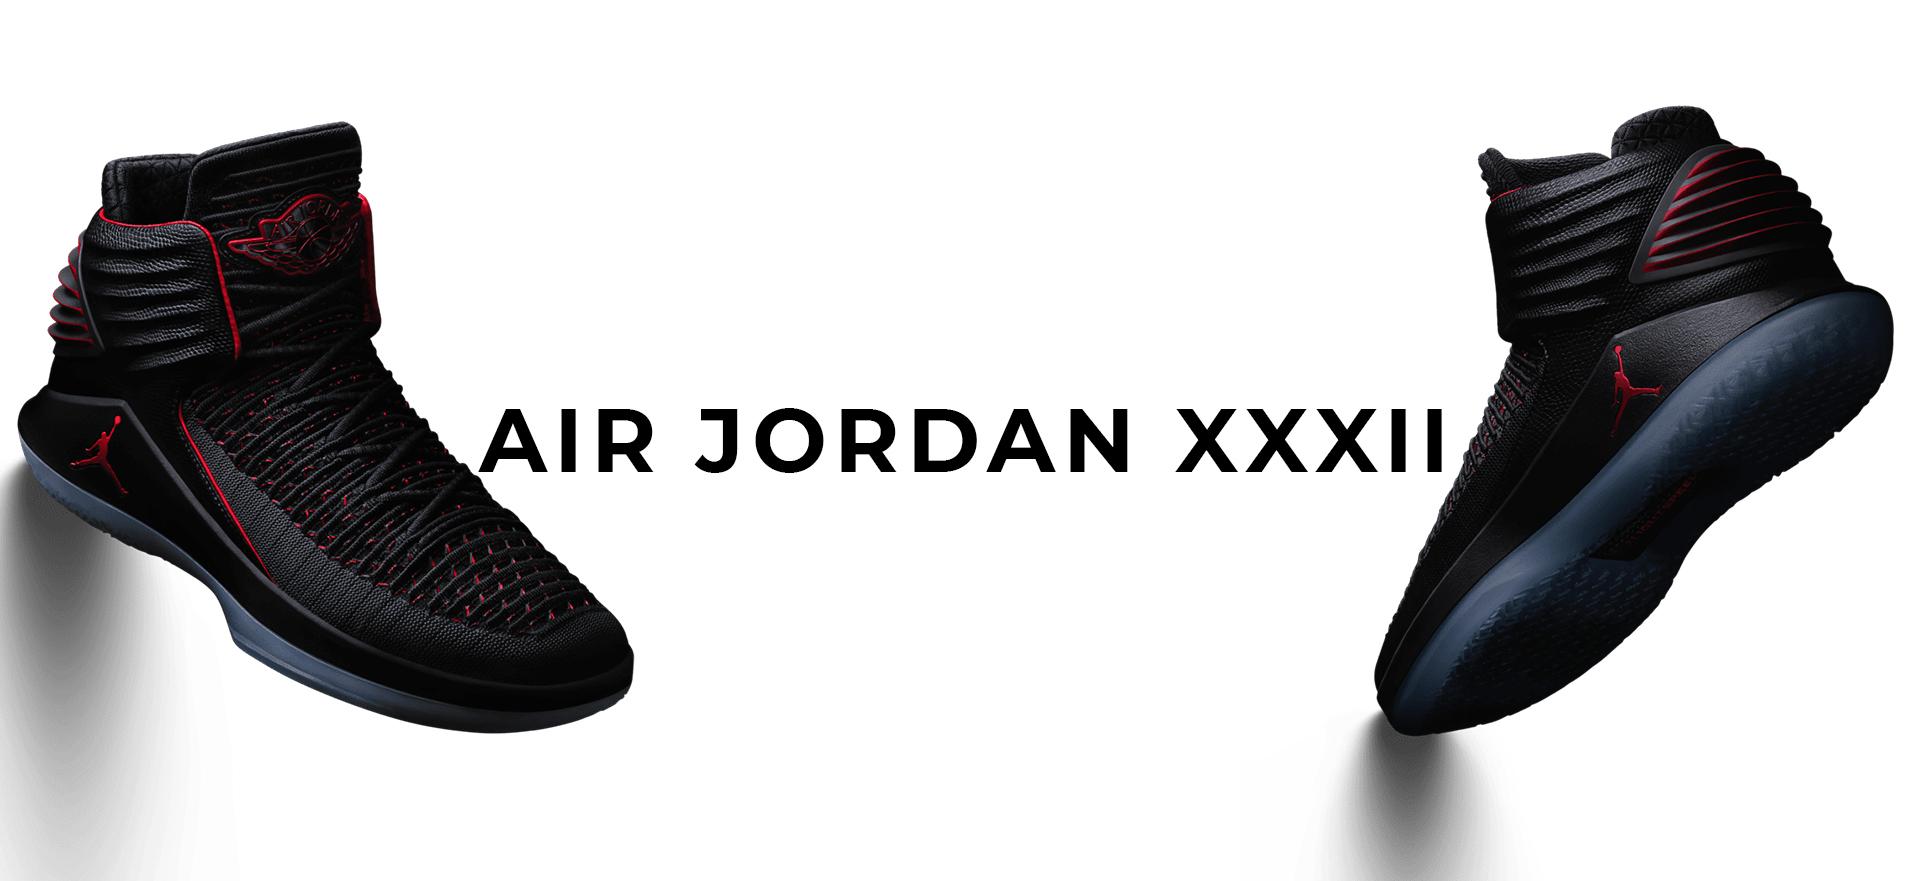 Air Jordan XXXII — mcmag.ru — все модели джордан